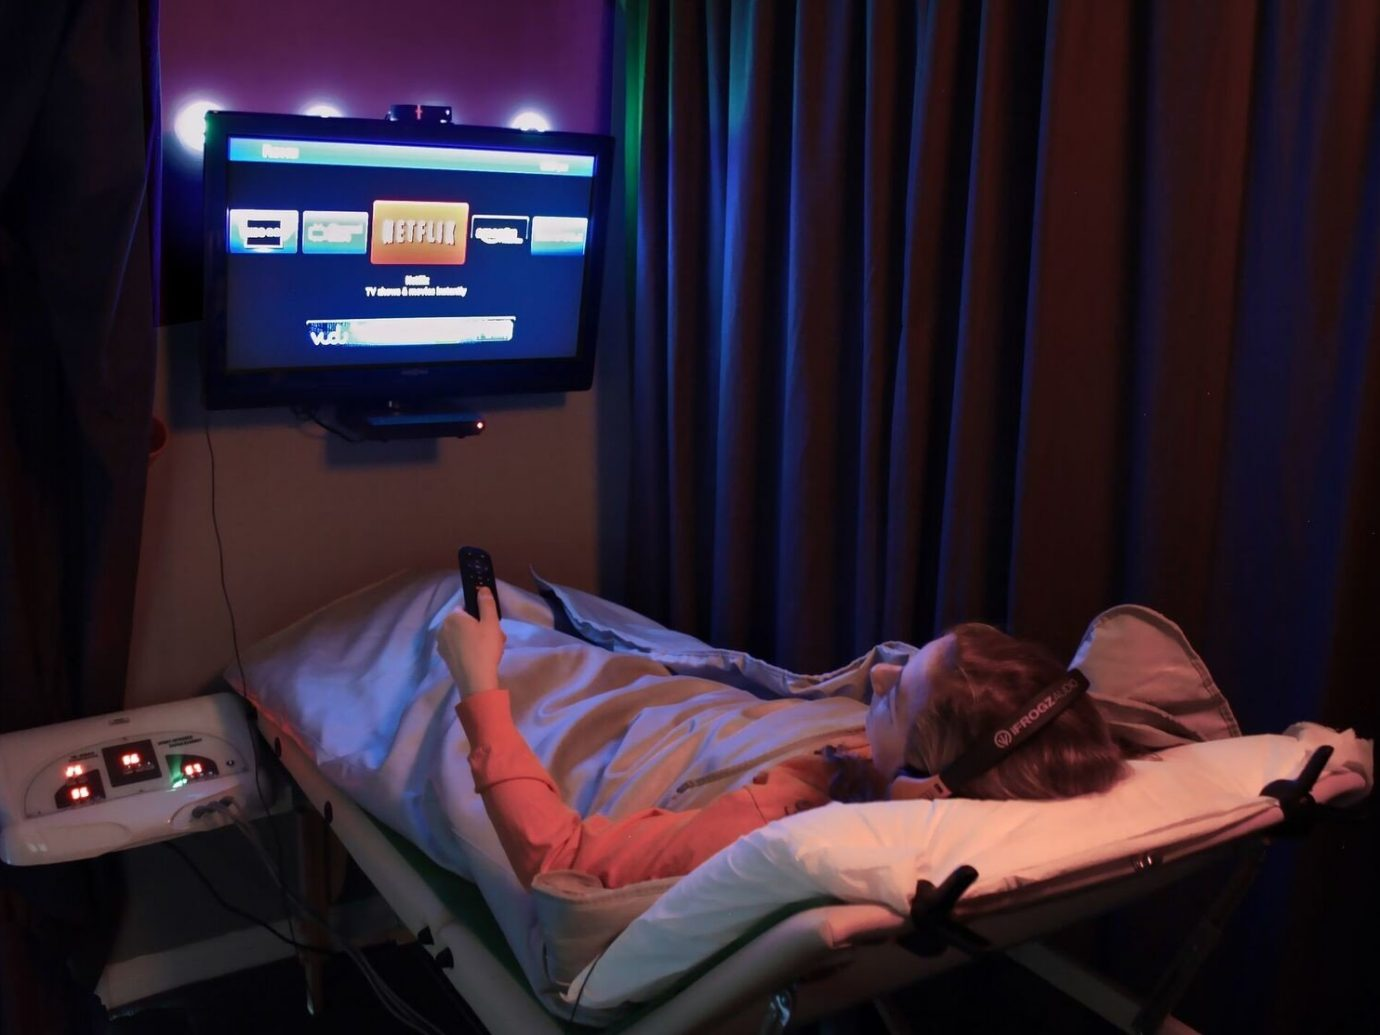 Health + Wellness Spa Retreats Trip Ideas indoor curtain room screenshot